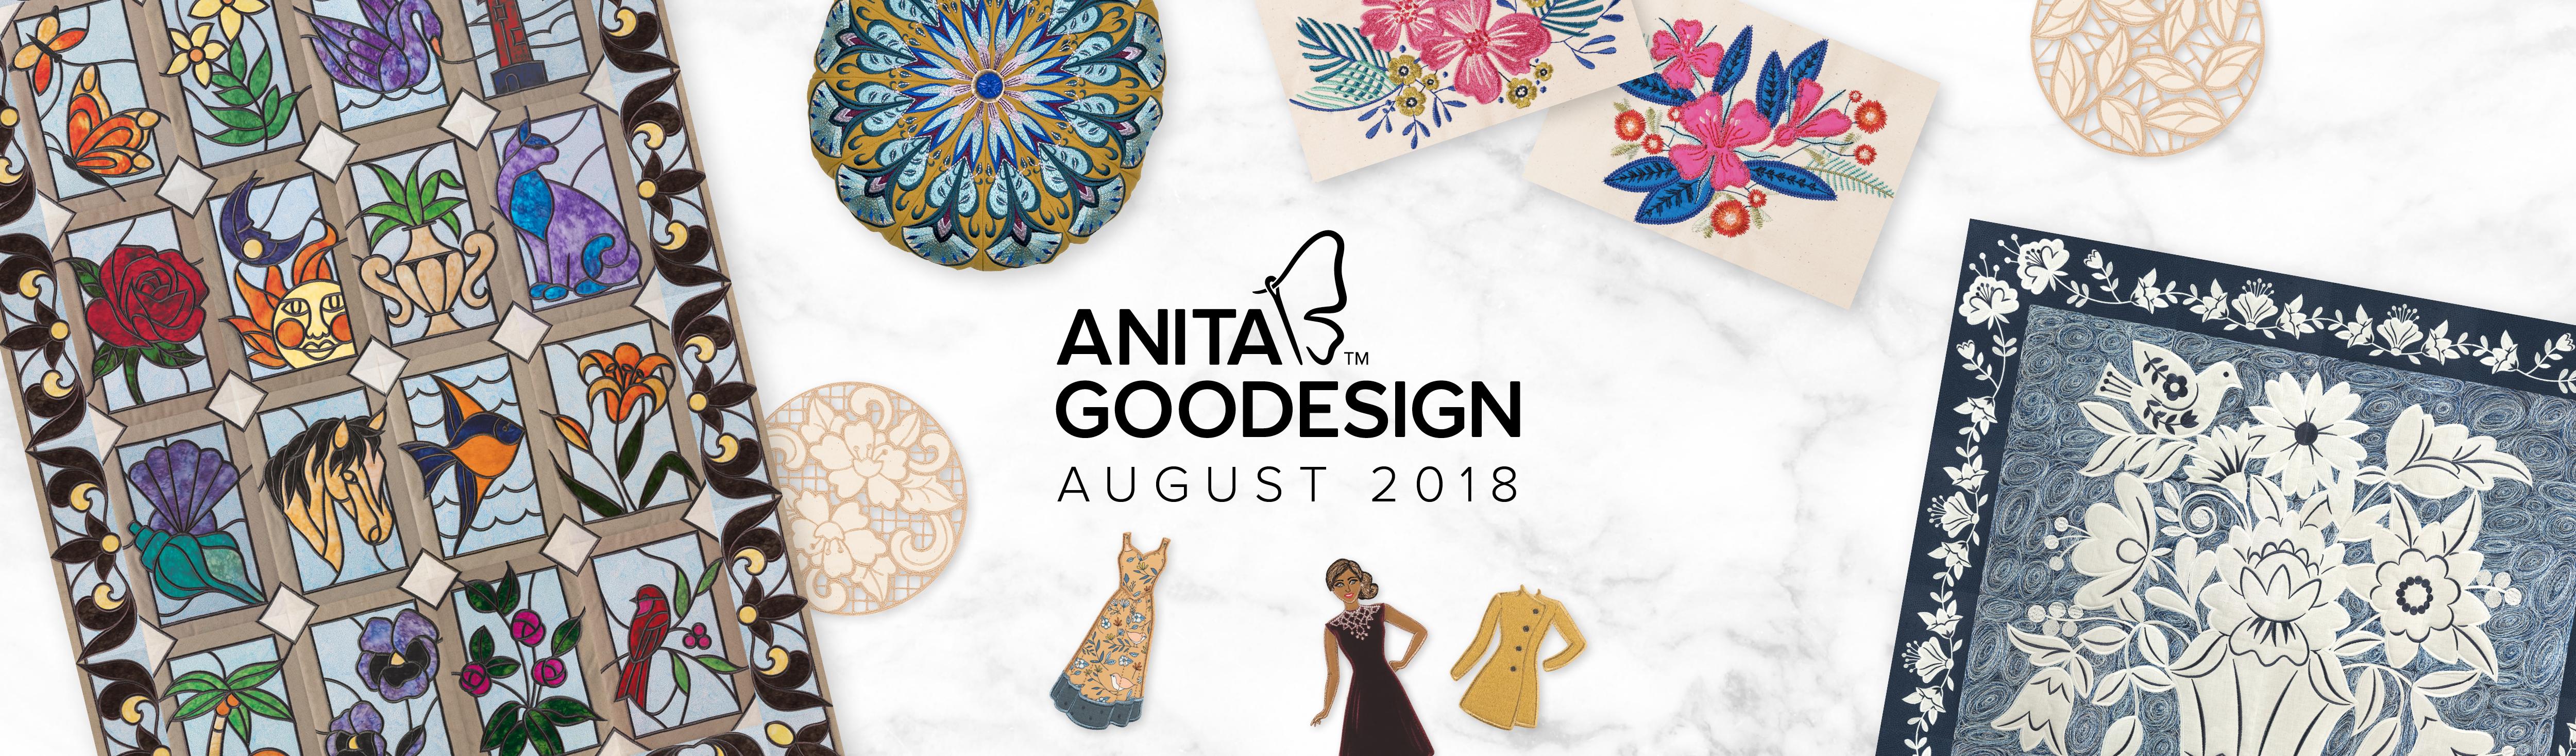 Machine Embroidery Designs & Patterns | Anita Goodesign